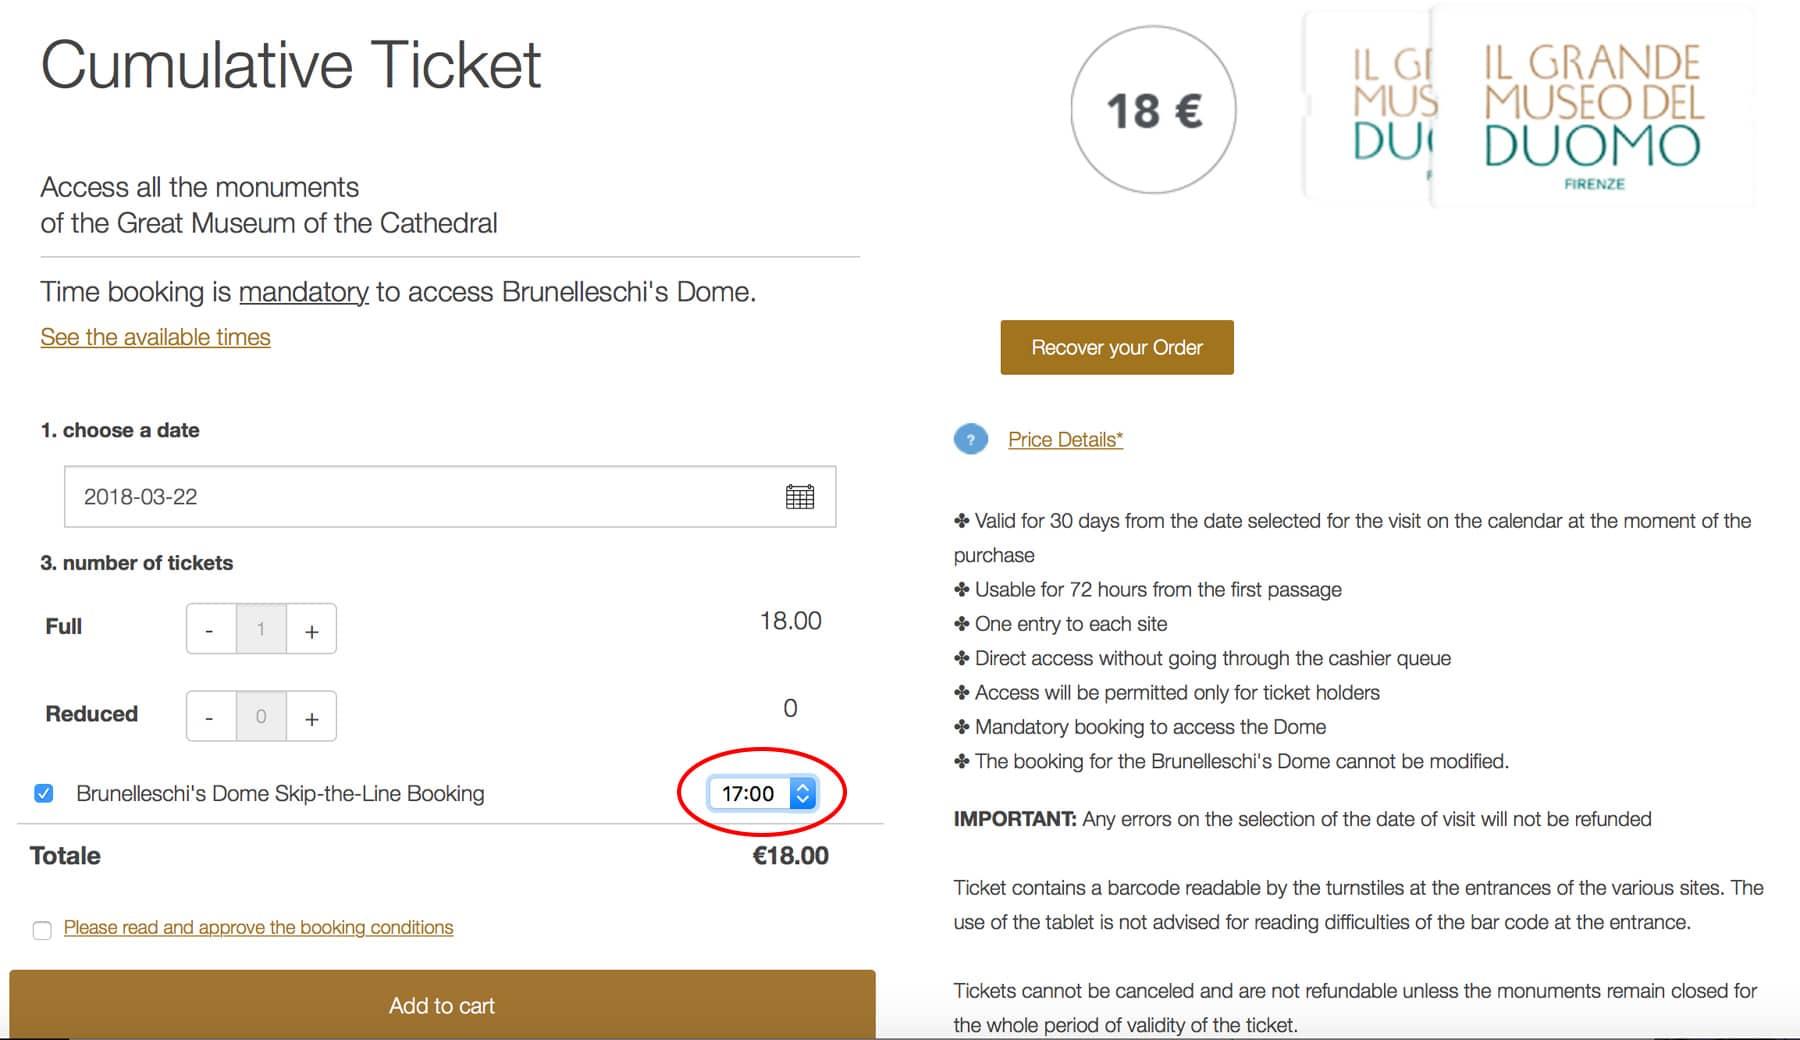 Kupit bilety na kupol Santa Mariya del Fore - Флорентийская прогулка по Санта-Мария-дель-Фьоре